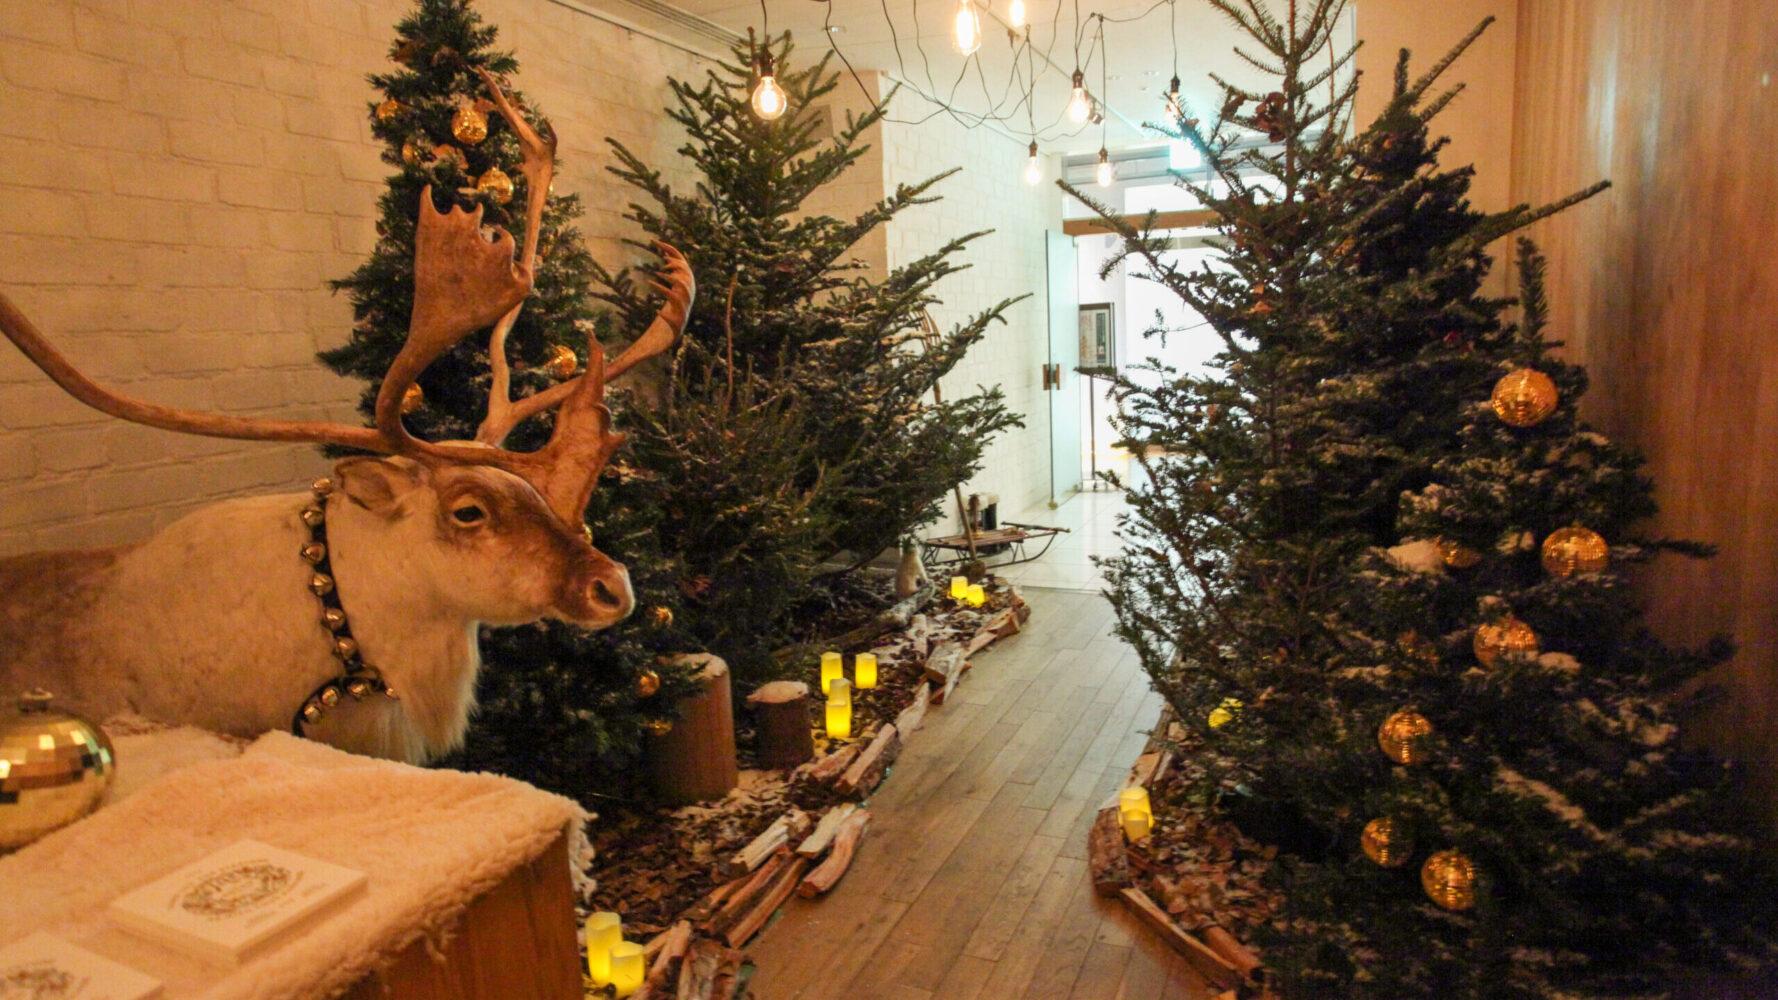 (marunouchi) HOUSE Christmas display 事例画像3